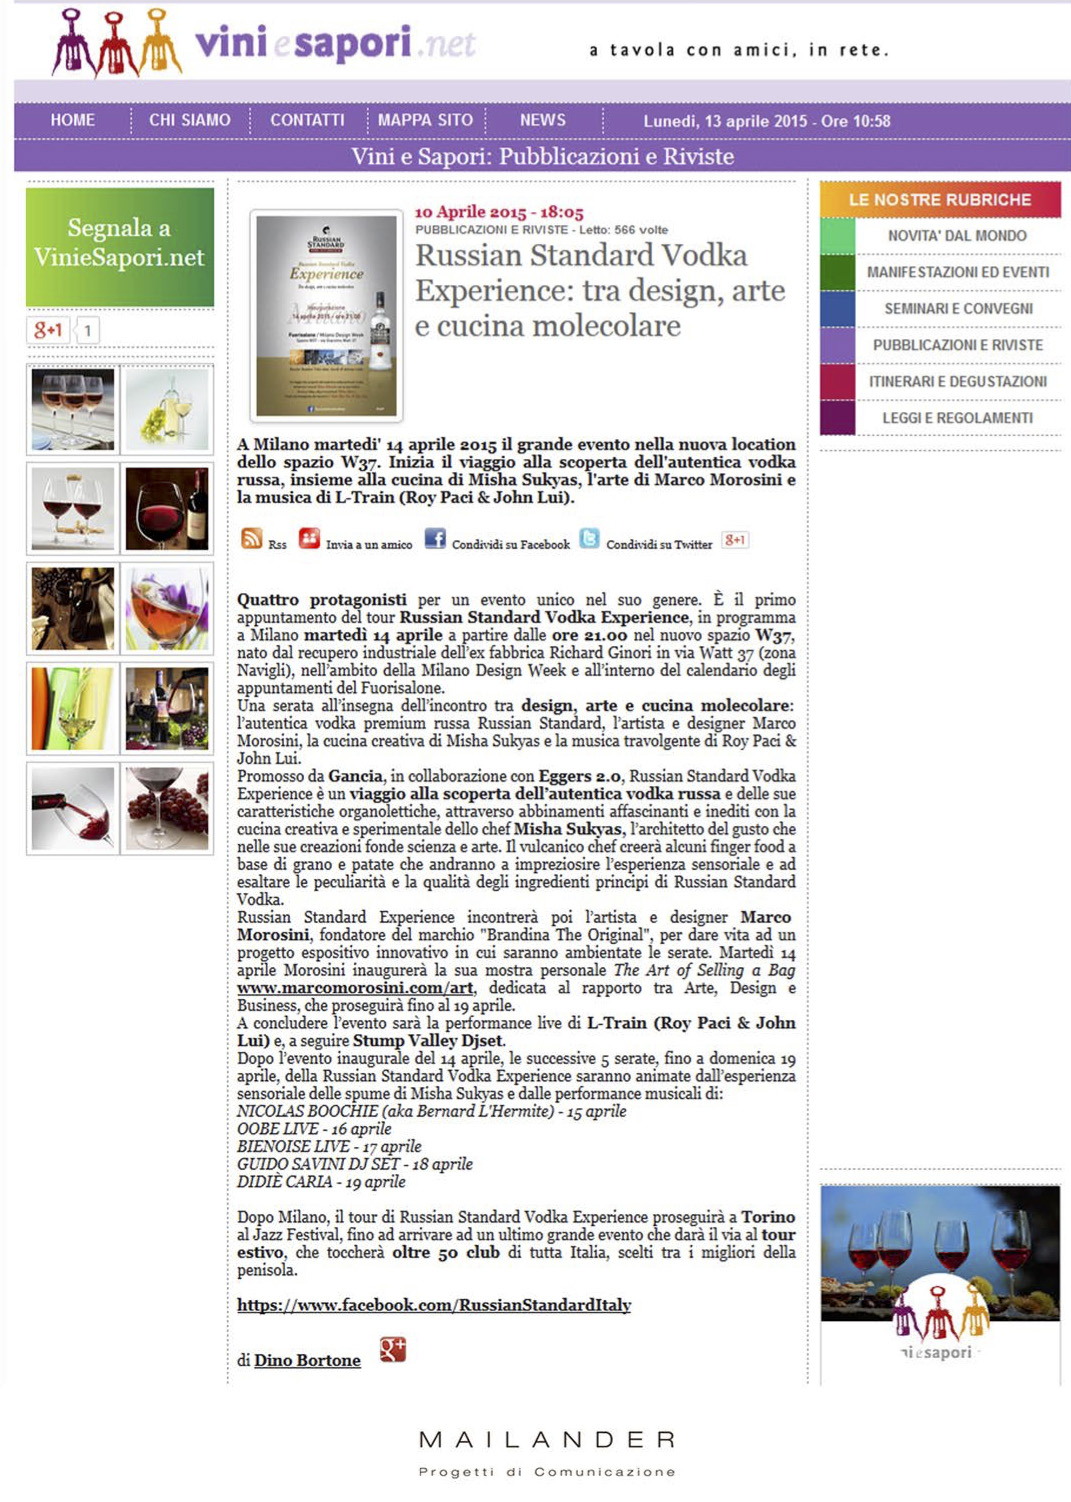 "<p><strong>Vini e Sapori</strong><a href=""/s/viniesapori_net_10_04_15.pdf"" target=""_blank"">Download →</a></p>"